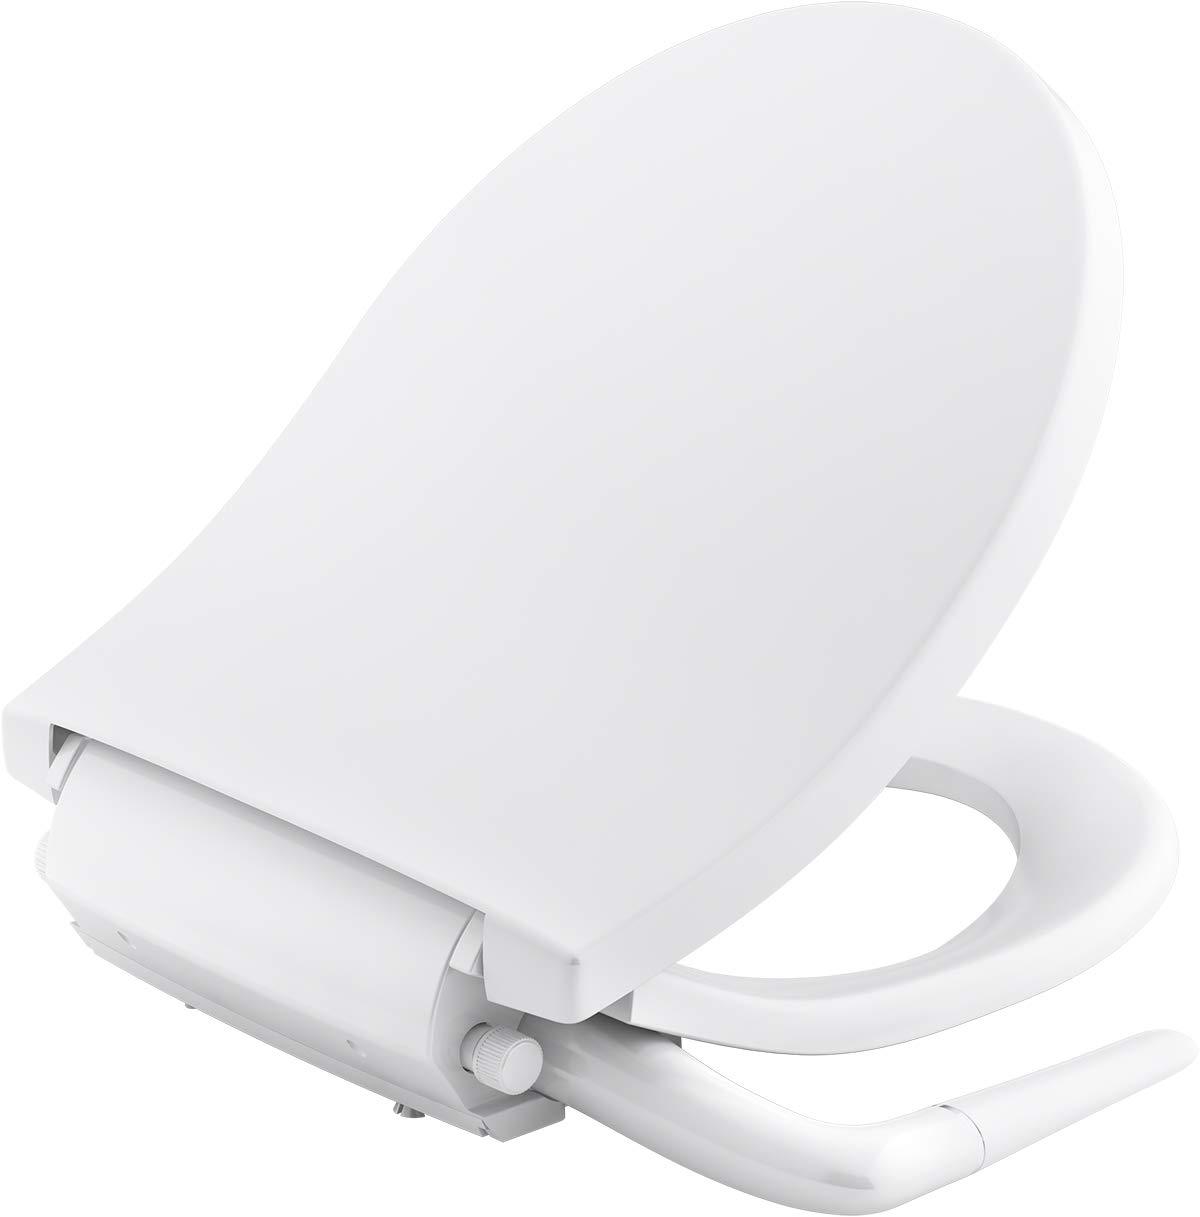 KOHLER K-76923-0 Puretide Round Front Manual Bidet Toilet Seat Image